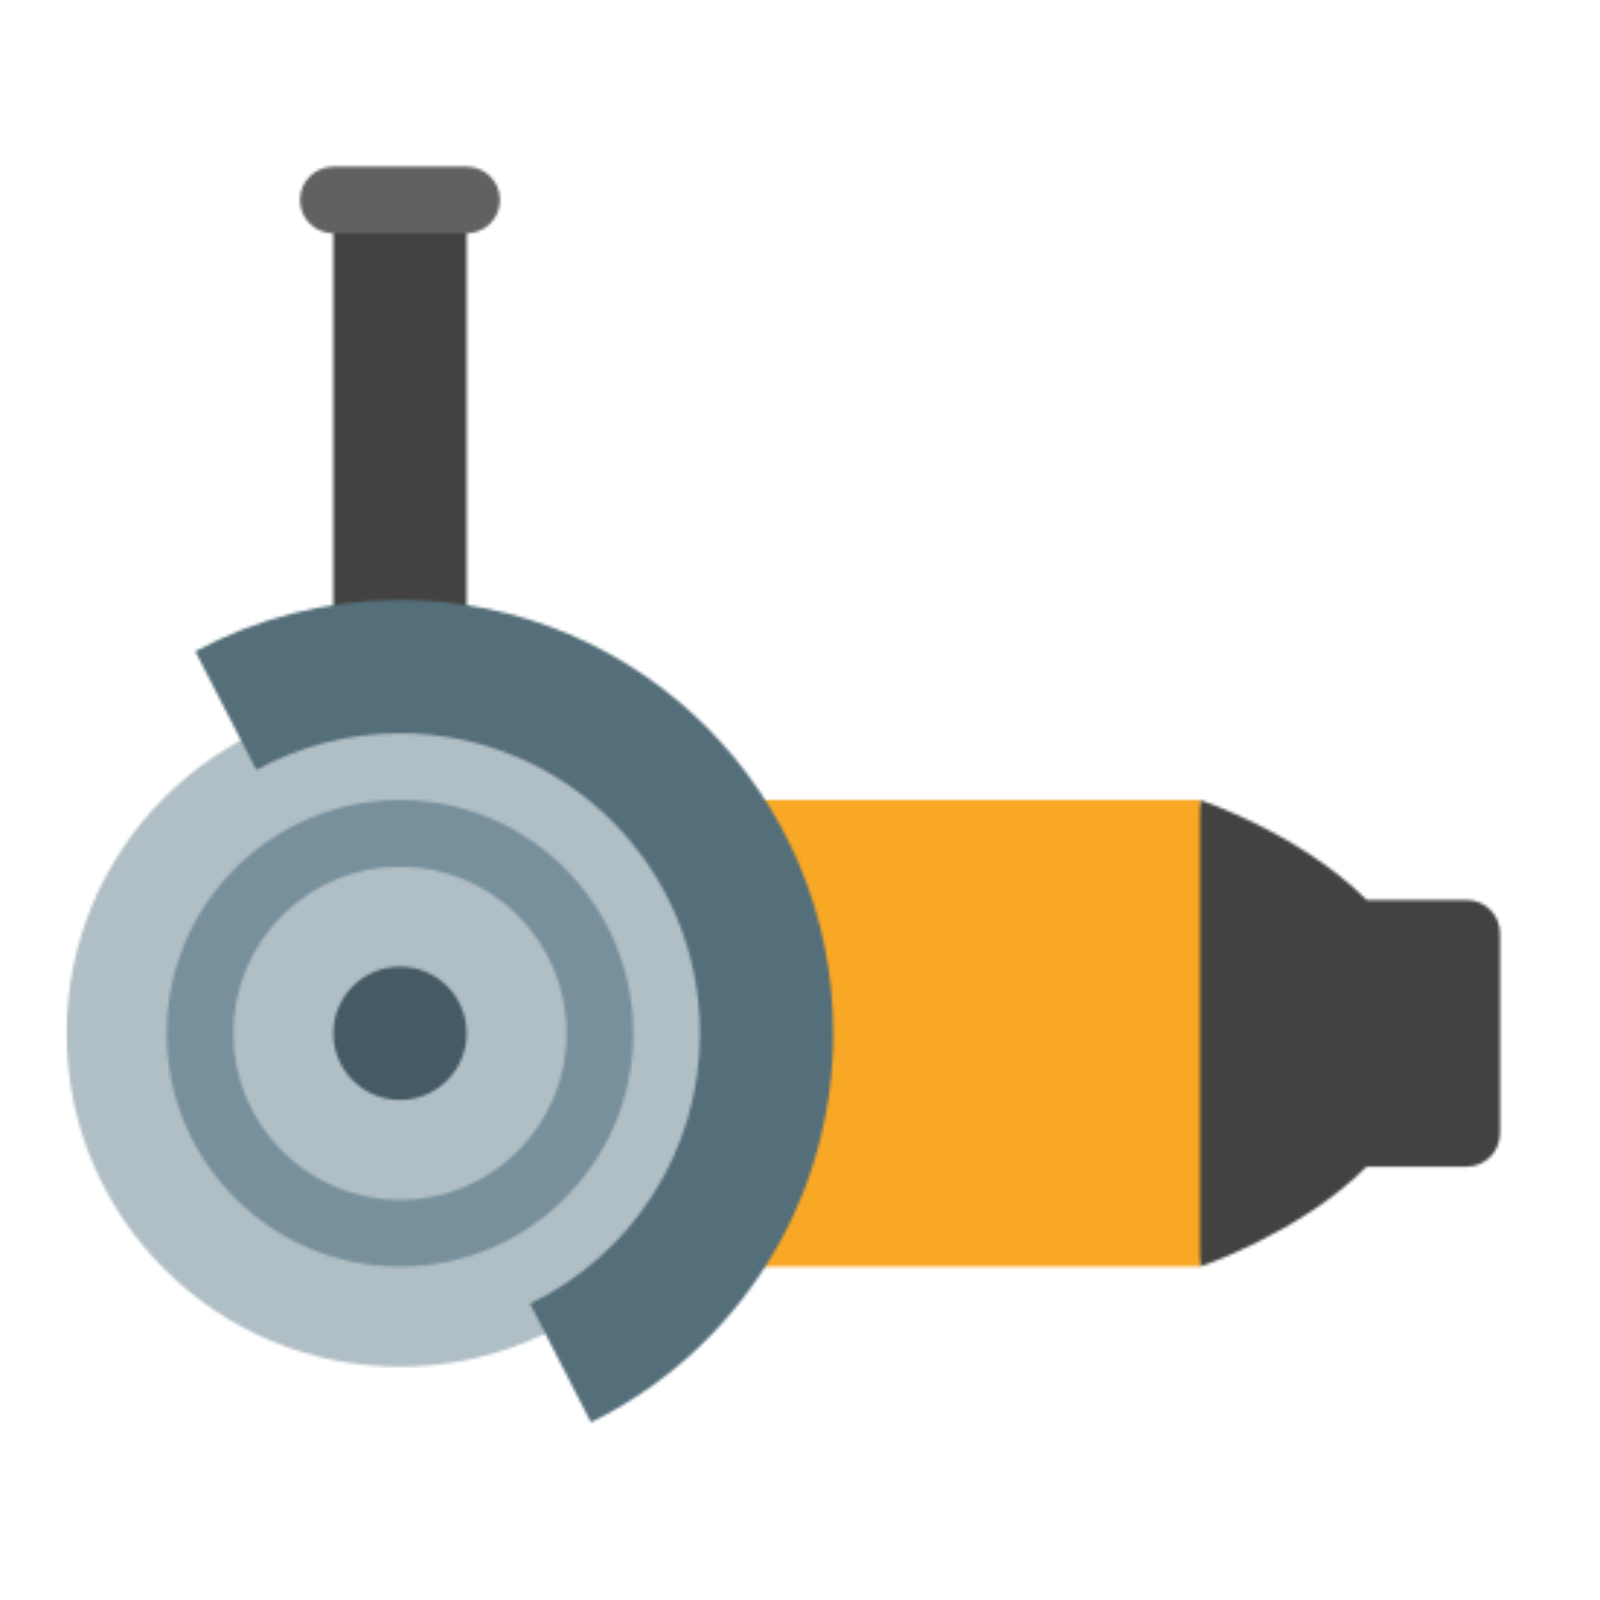 Máquina de afiar icon